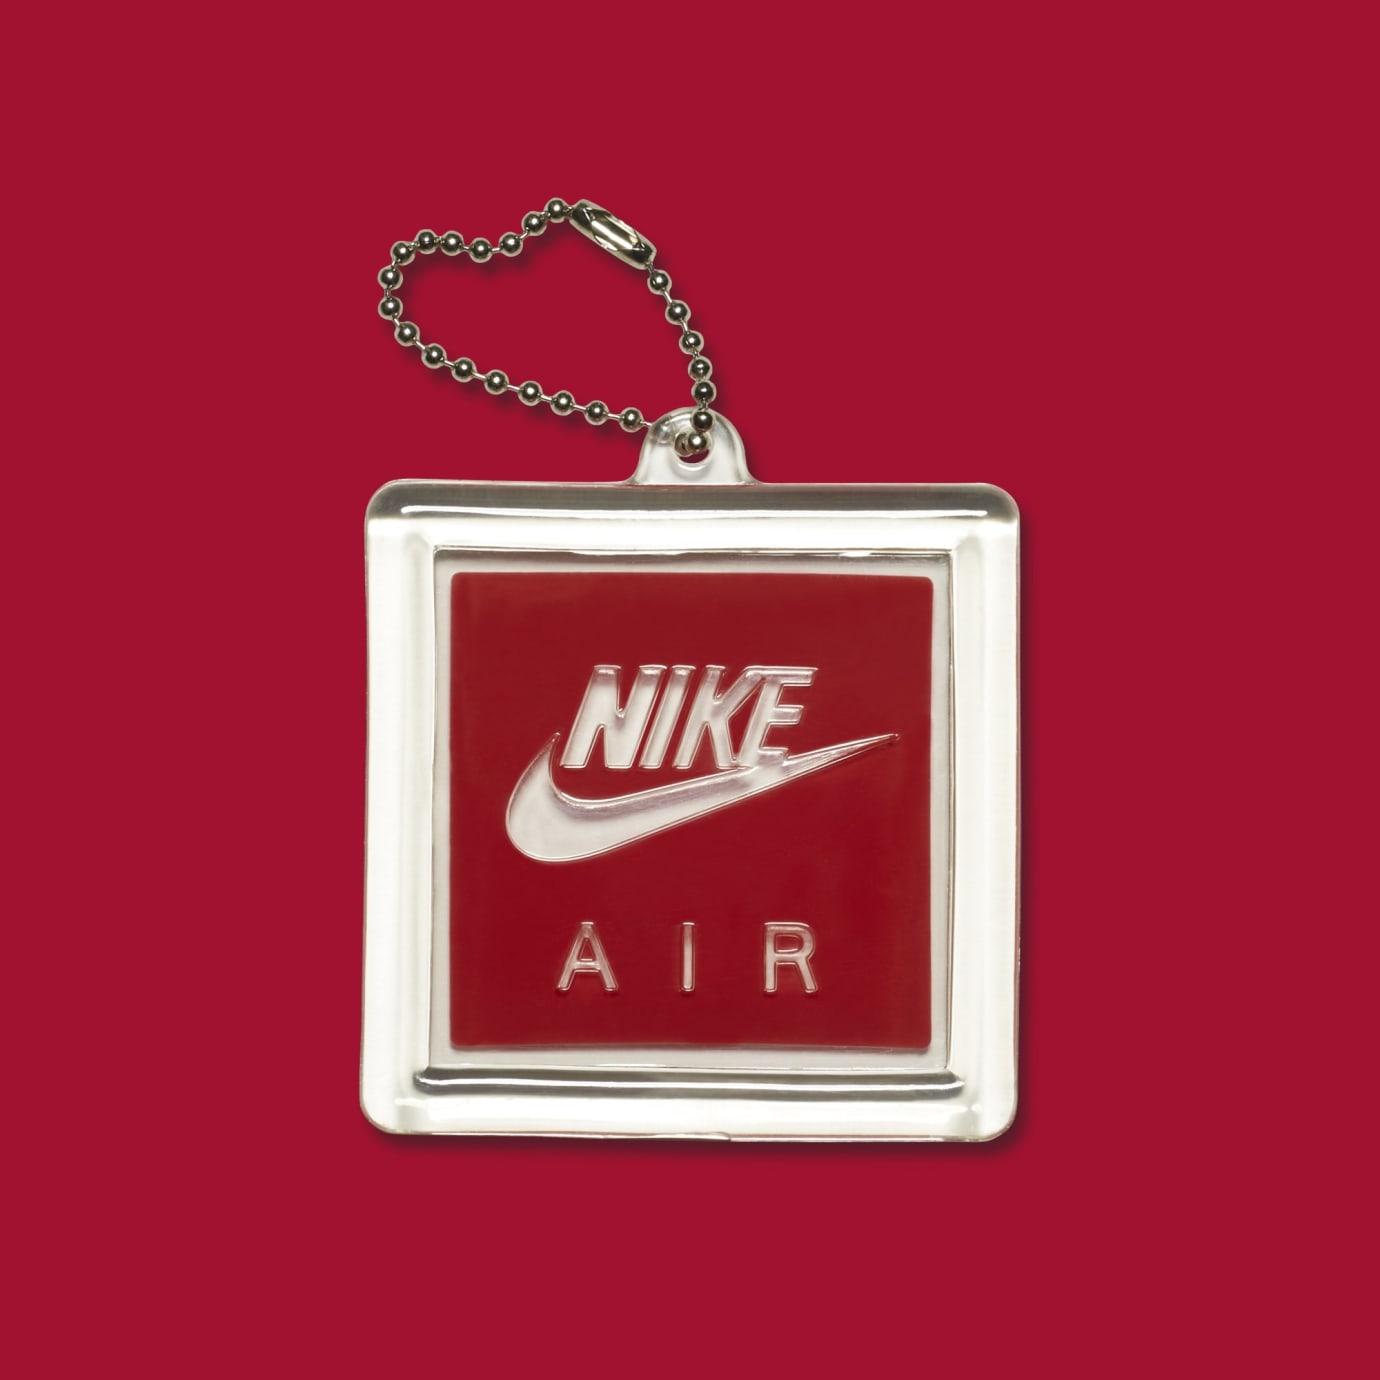 Air Jordan 3 TH SP CJ0939-100 (Tag)